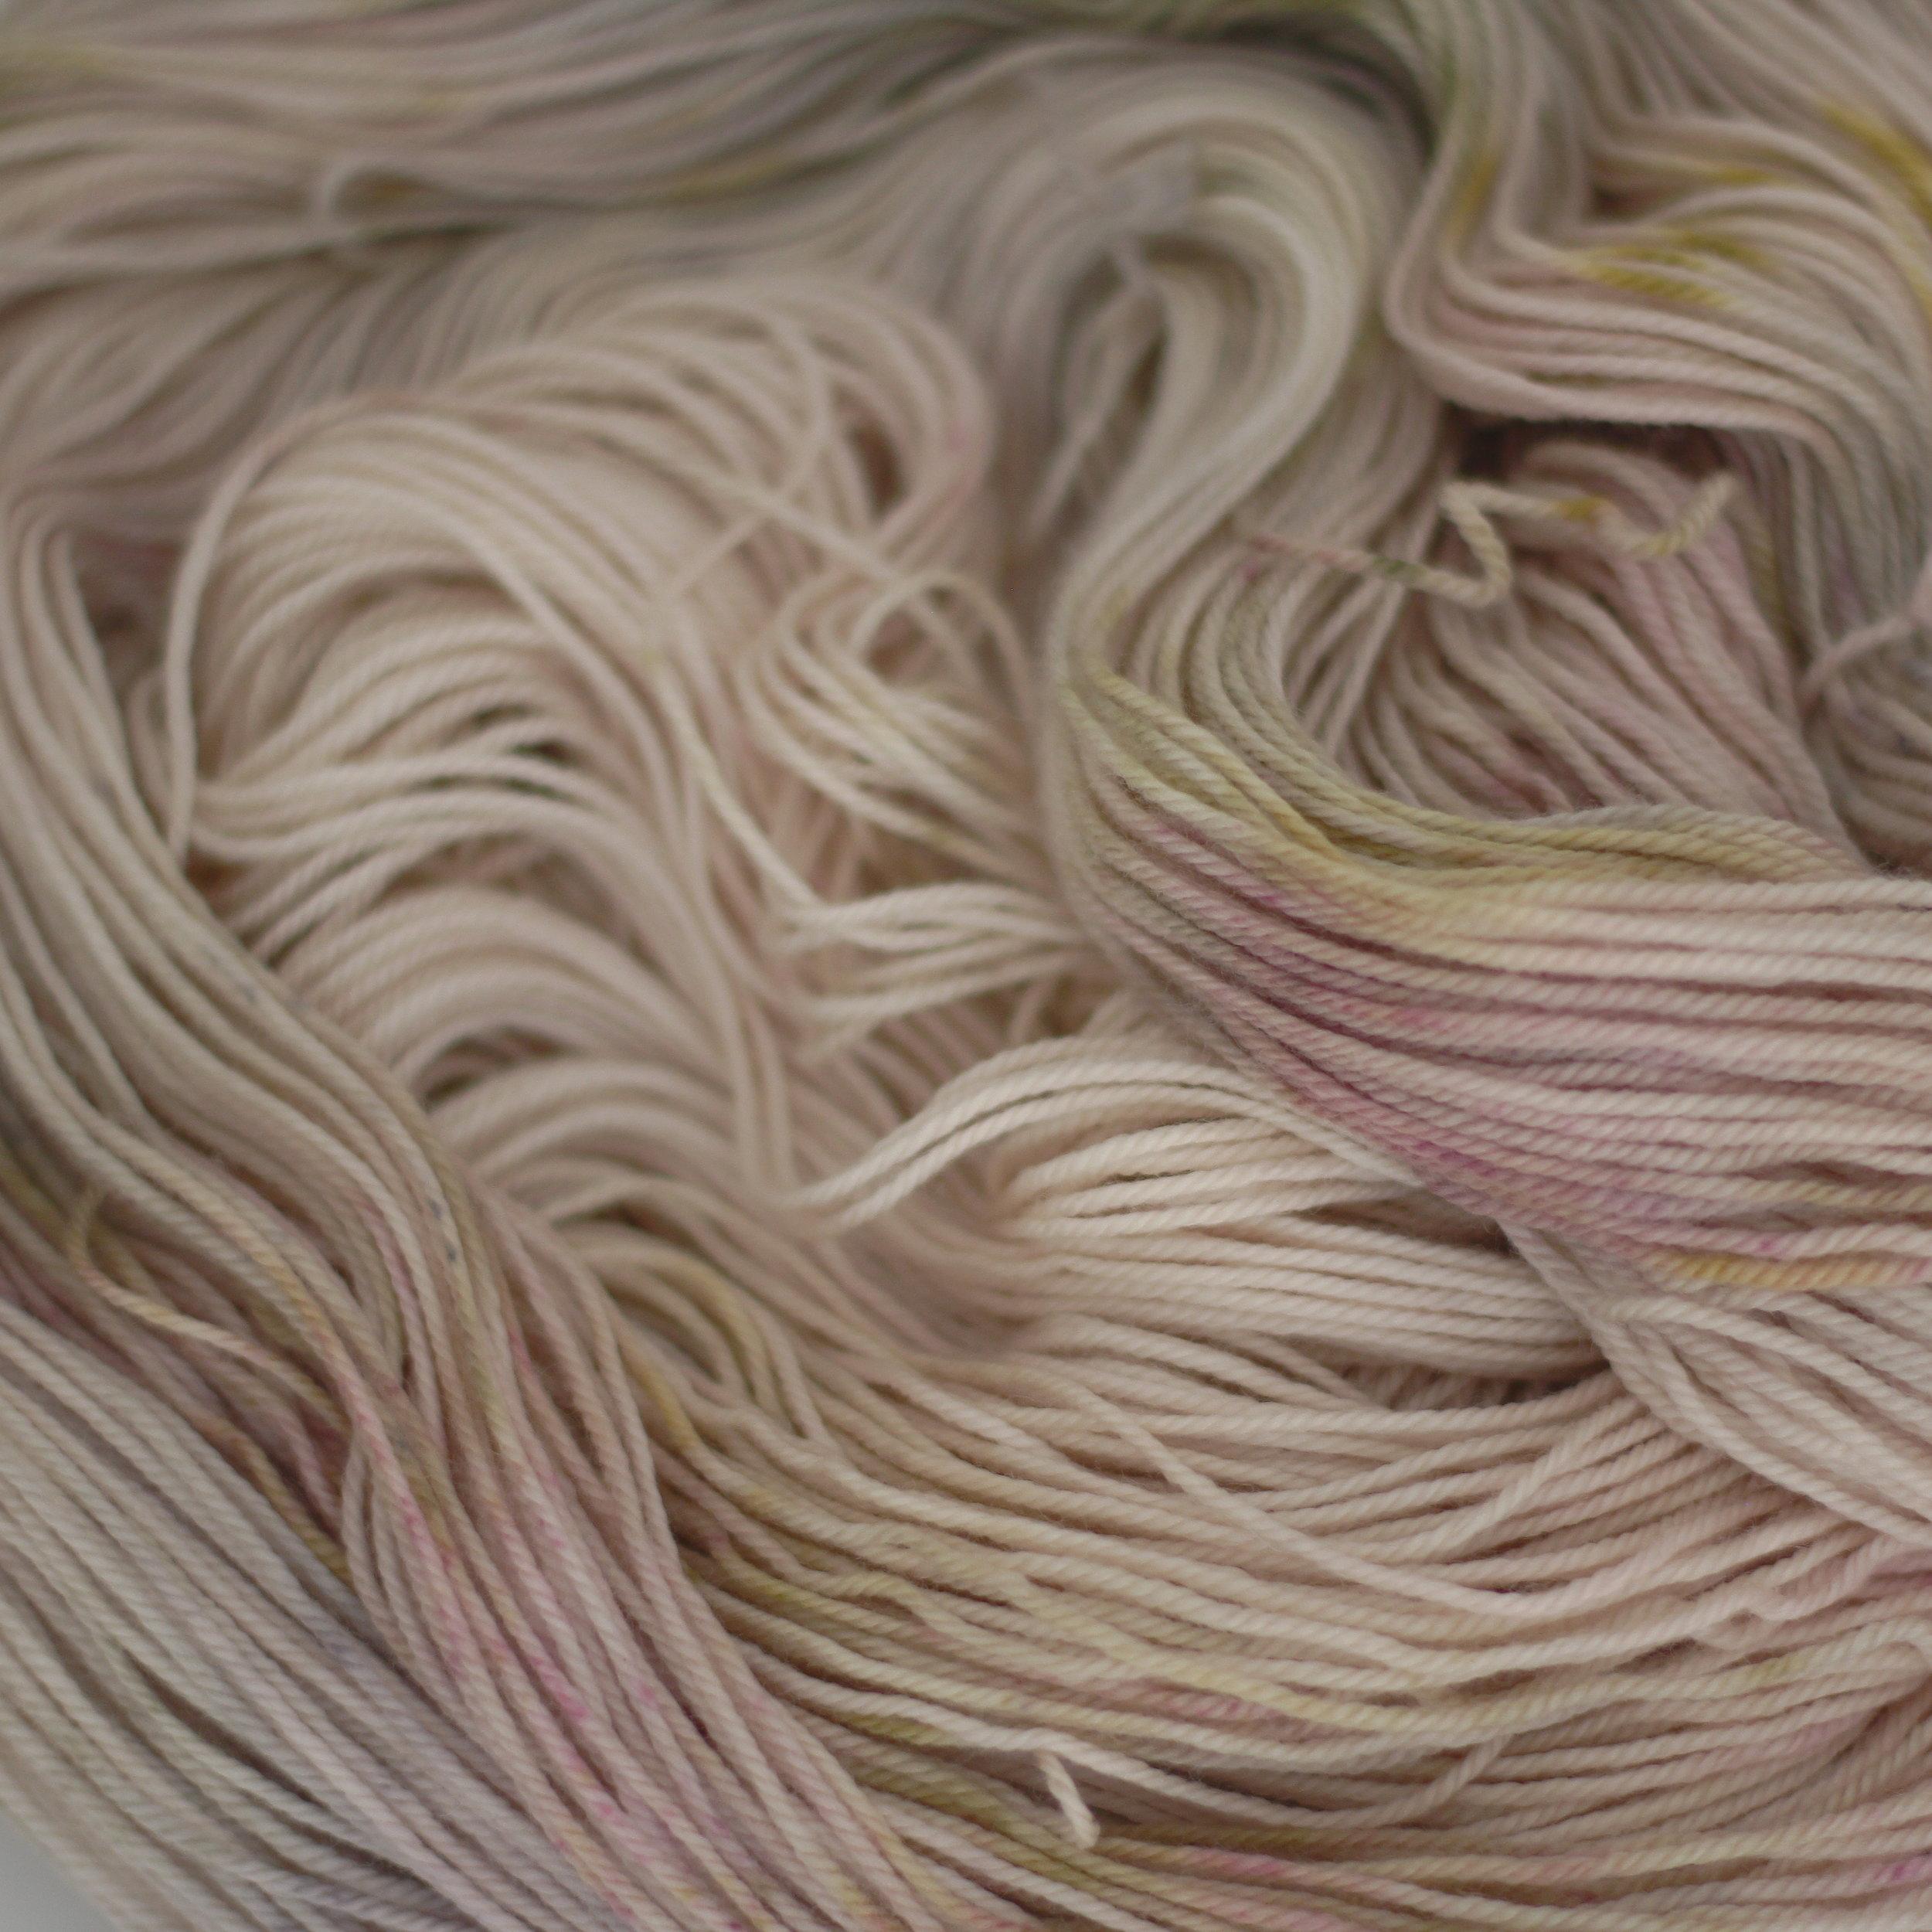 SECRET GARDEN     Cochineal   Dactylopius coccus   Goldenrod   Solidago canadensis   Logwood   Haematoxylon campechianum